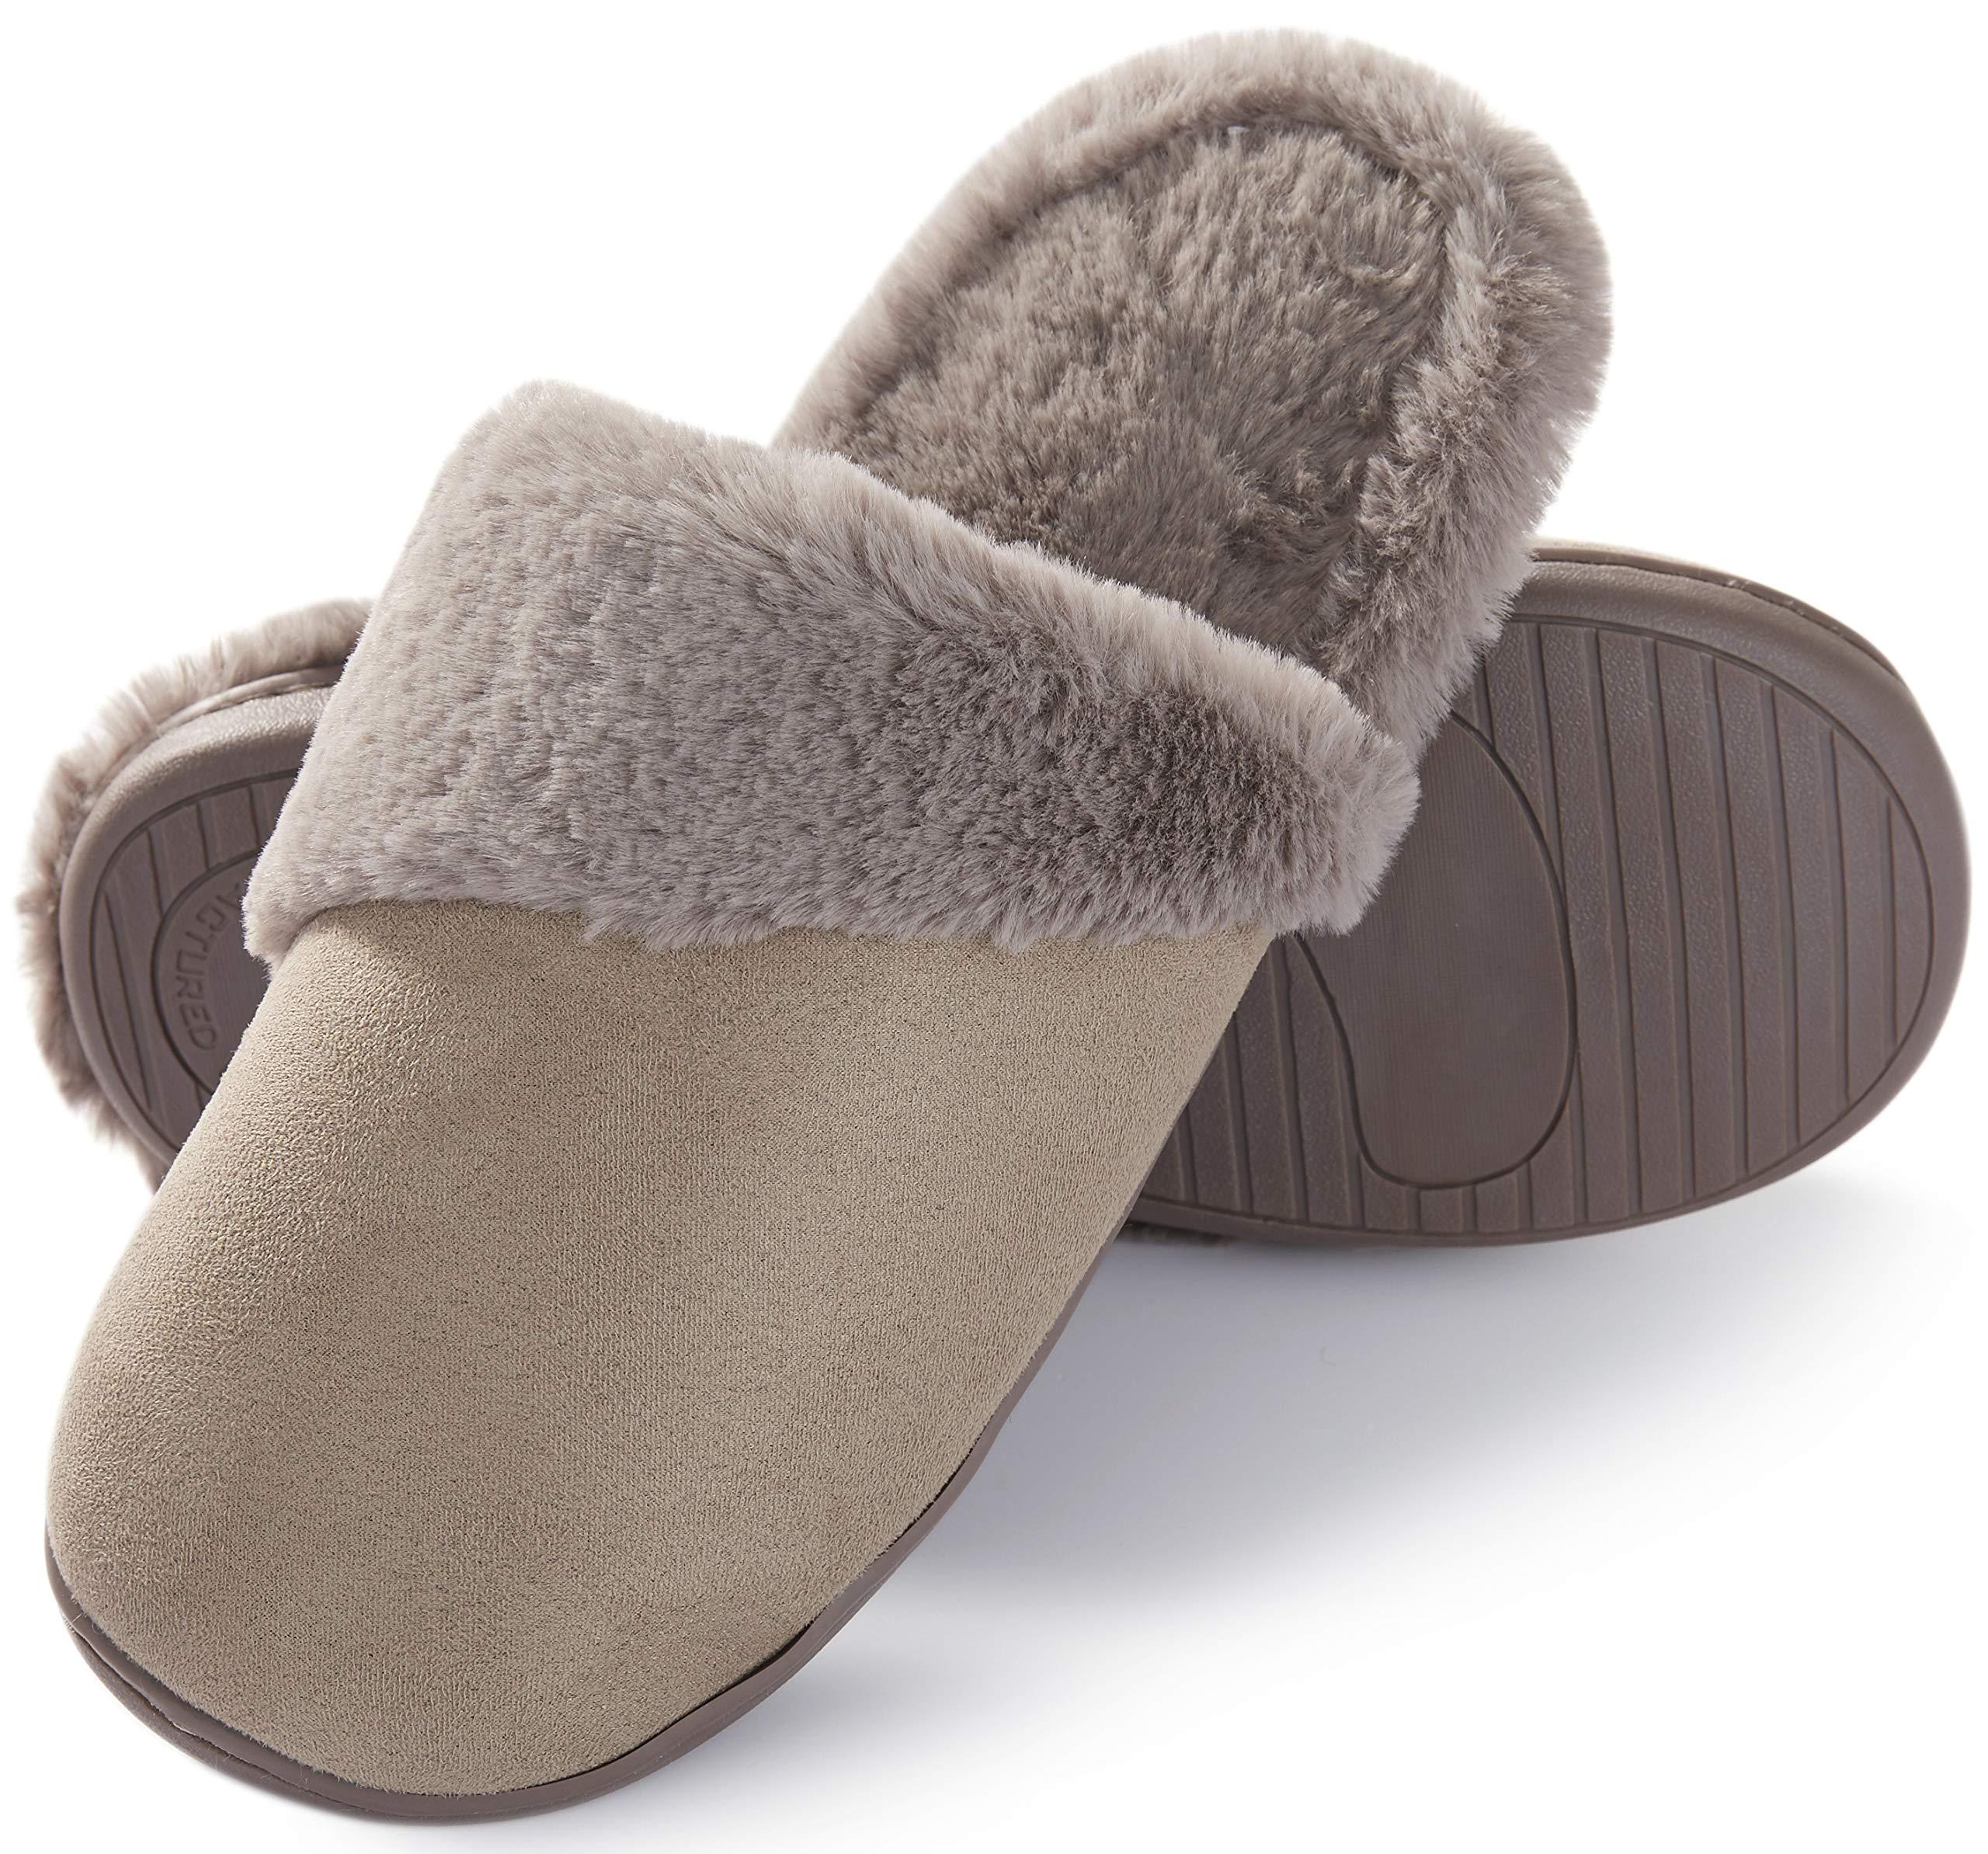 fb19a10ae363c Pantofole Scamosciate da Donna Interne Casa Morbida Autunno Inverno Memoria  Schiuma Pavimento Indoor Outdoor product image